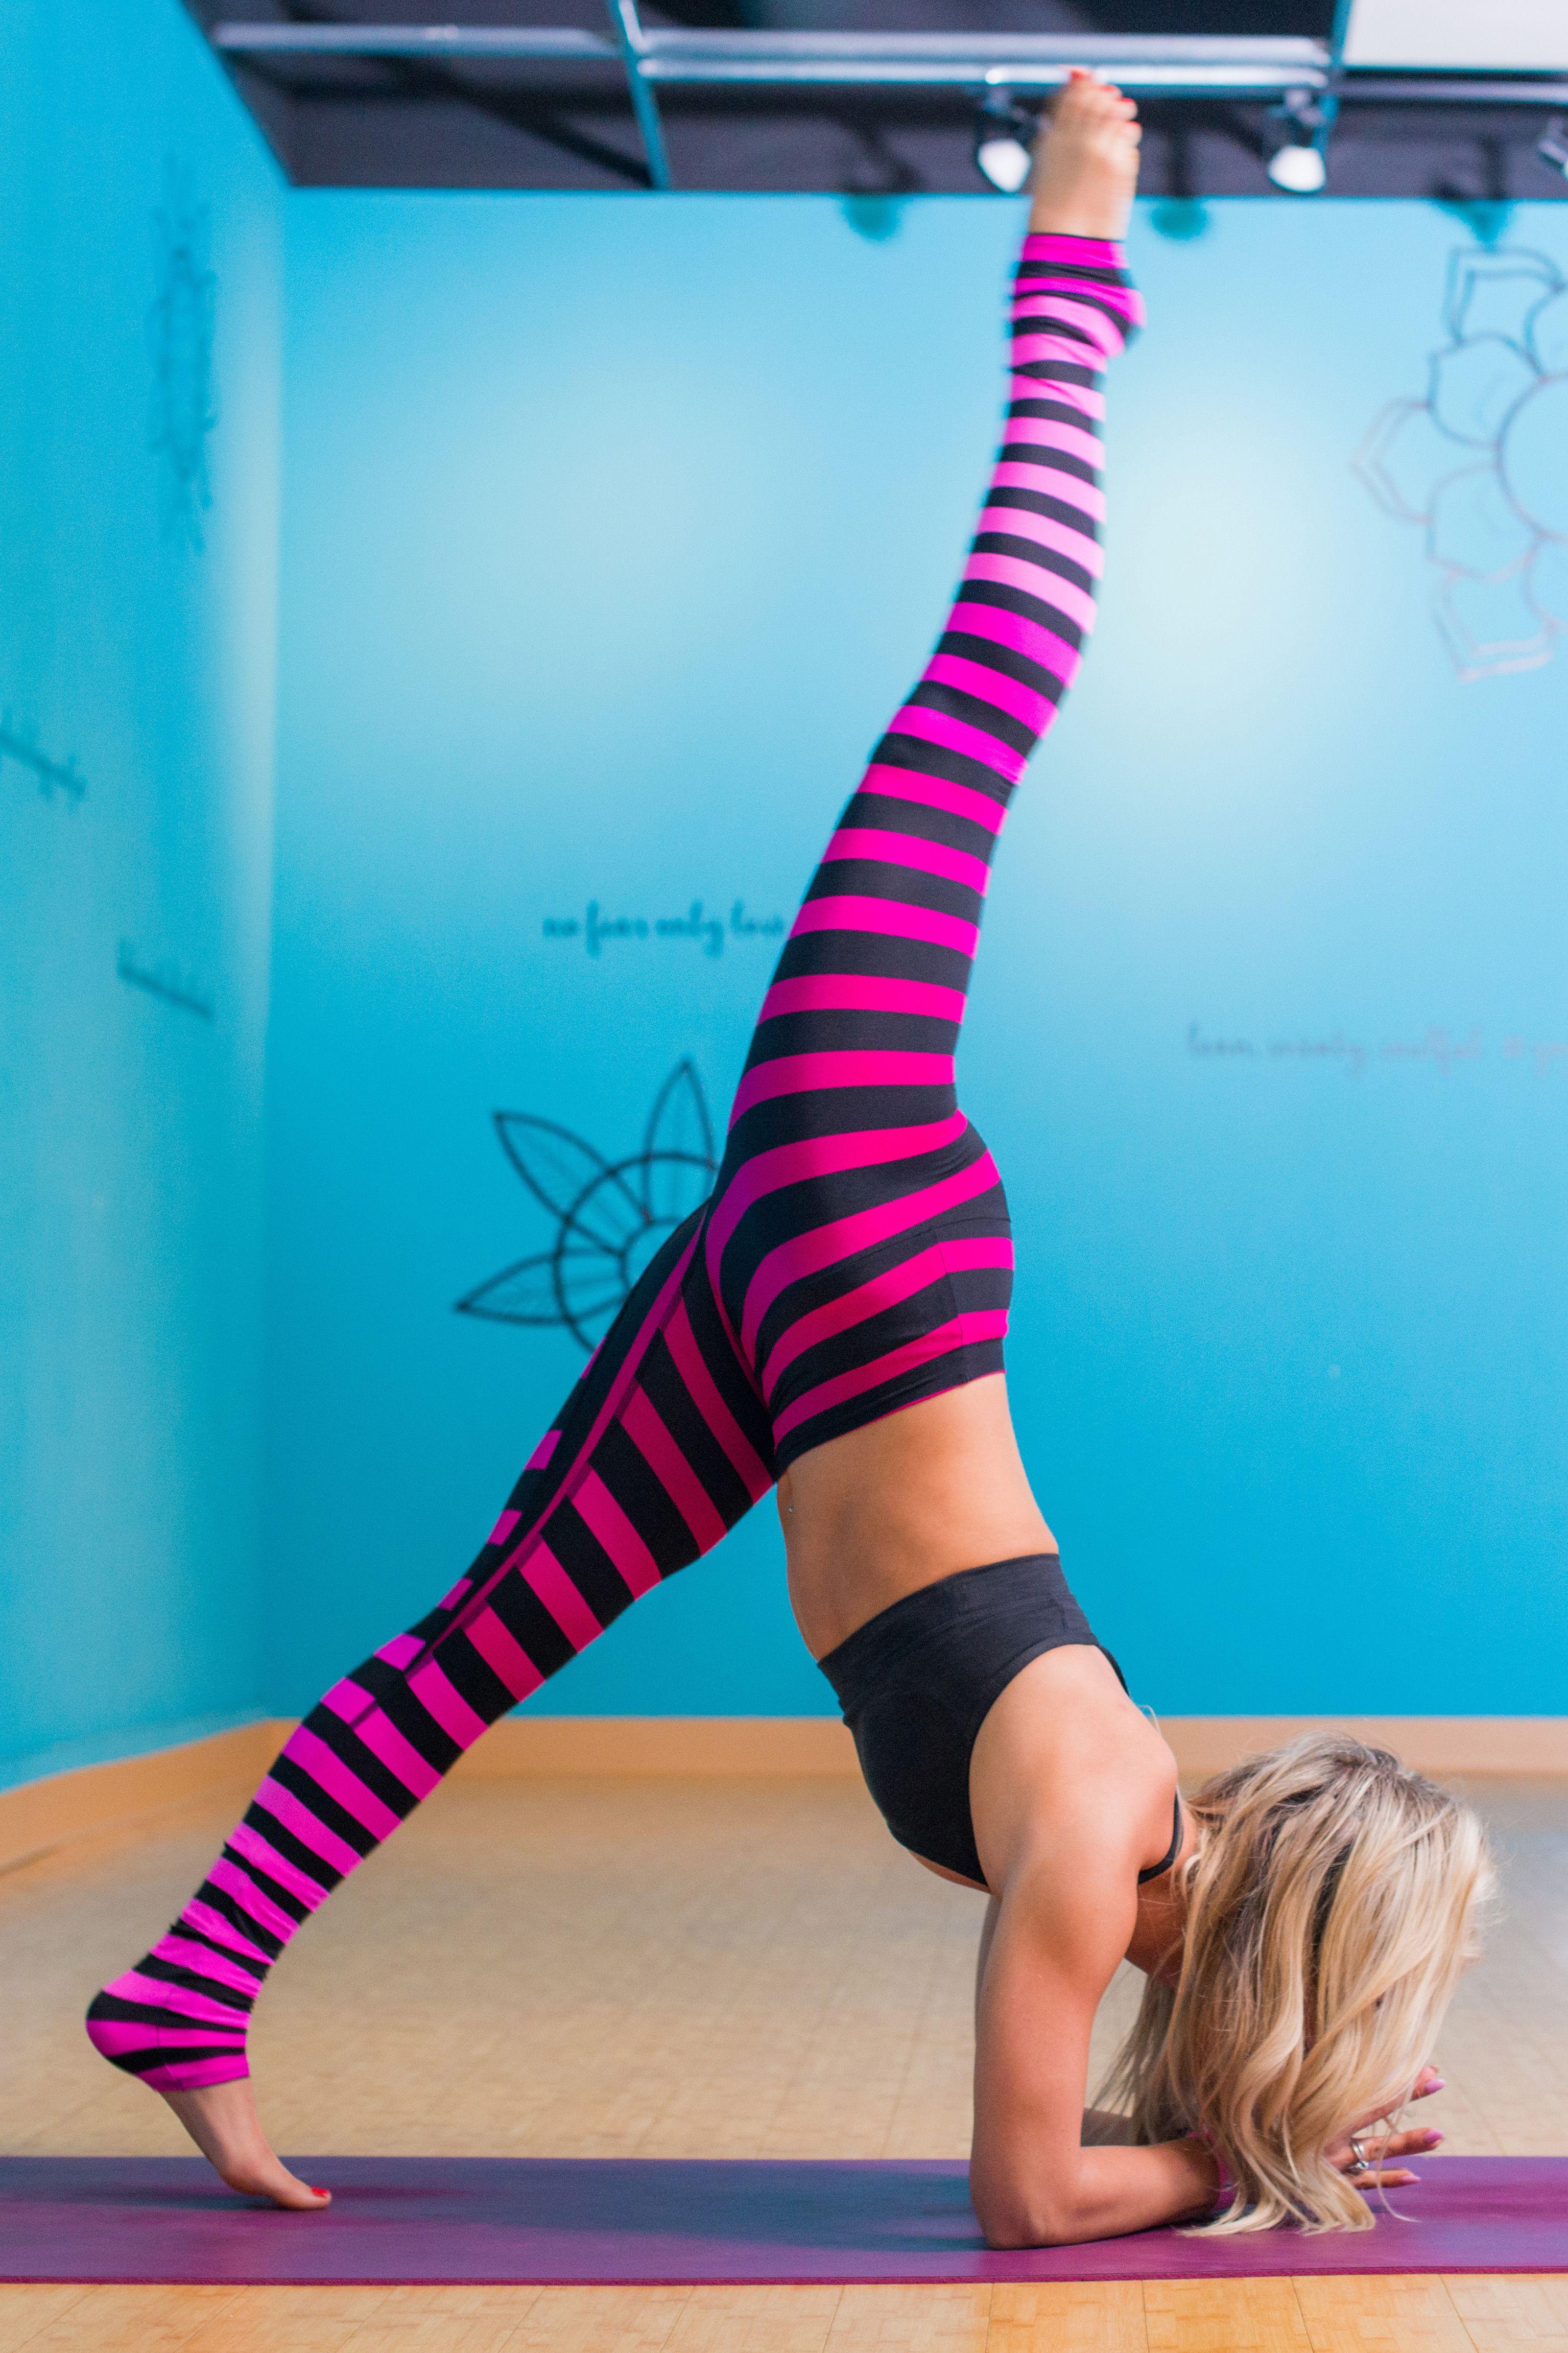 Thunderbolt Power Yoga Hot Power Yoga Studio Located In Buckhead Atlanta Ga Dedicated To Creating The Ultimate Yoga Experie Atlanta Yoga Power Yoga Hot Yoga